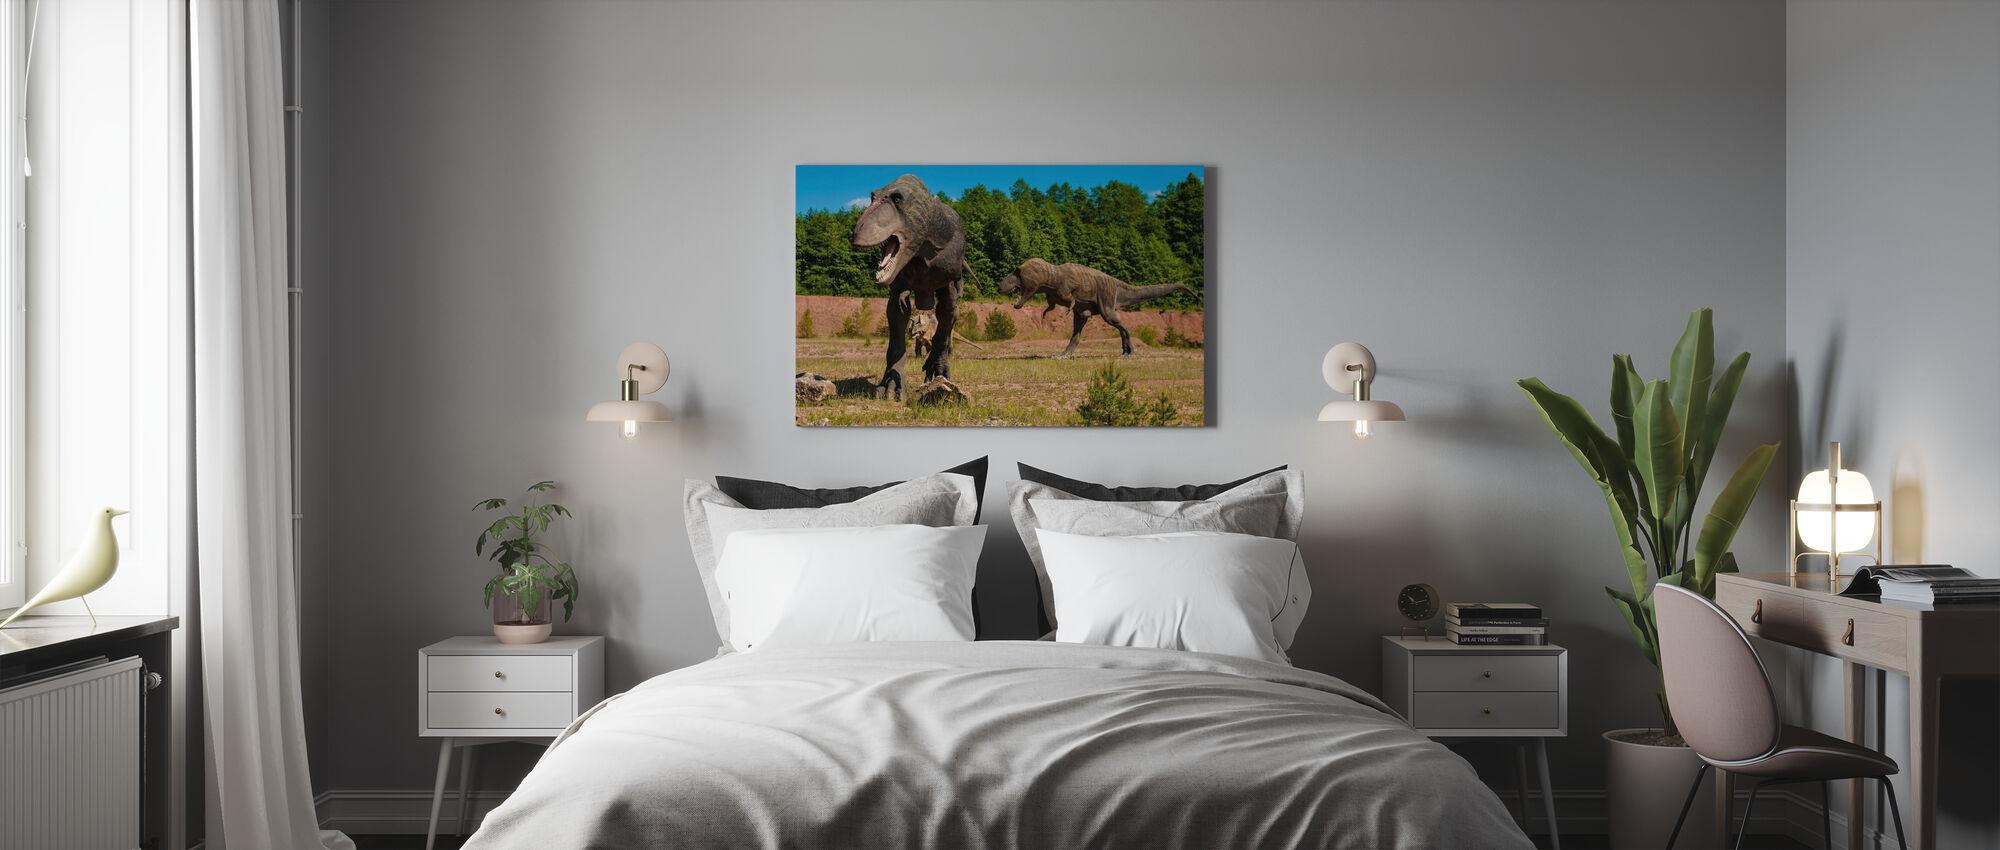 Monstrous Dinosaur - Canvas print - Bedroom